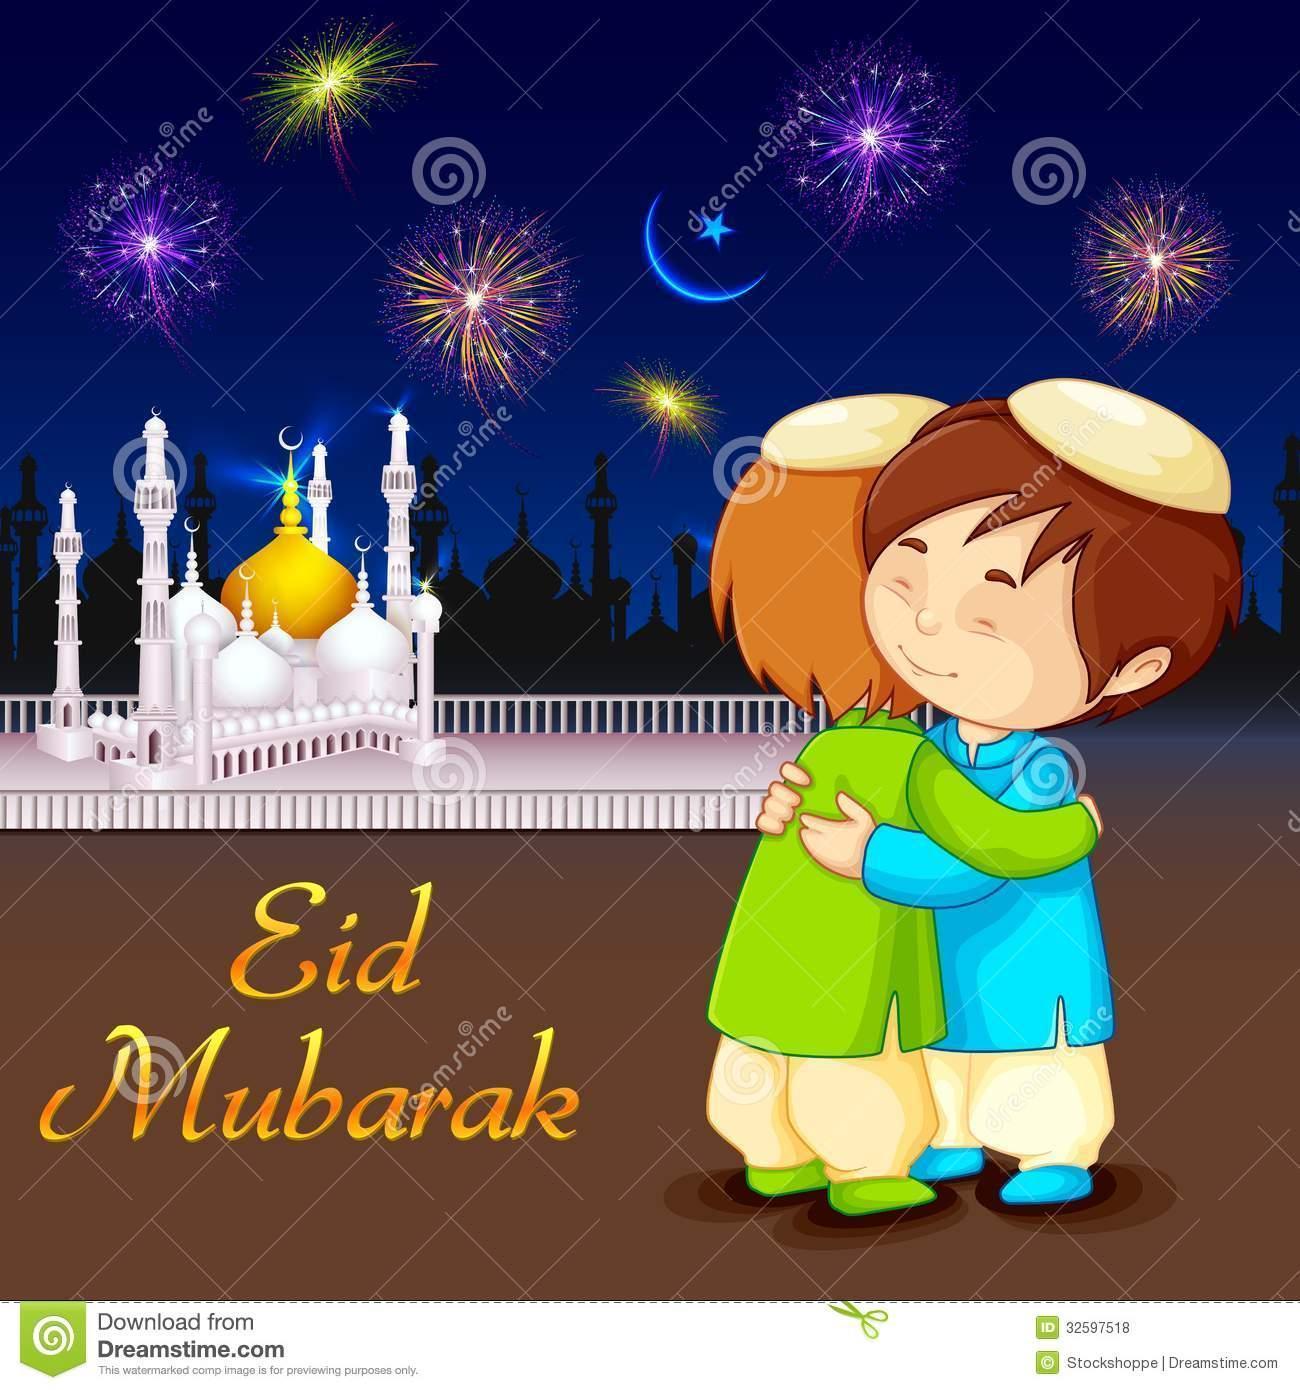 eid mubarak wallpaper for android - apk download